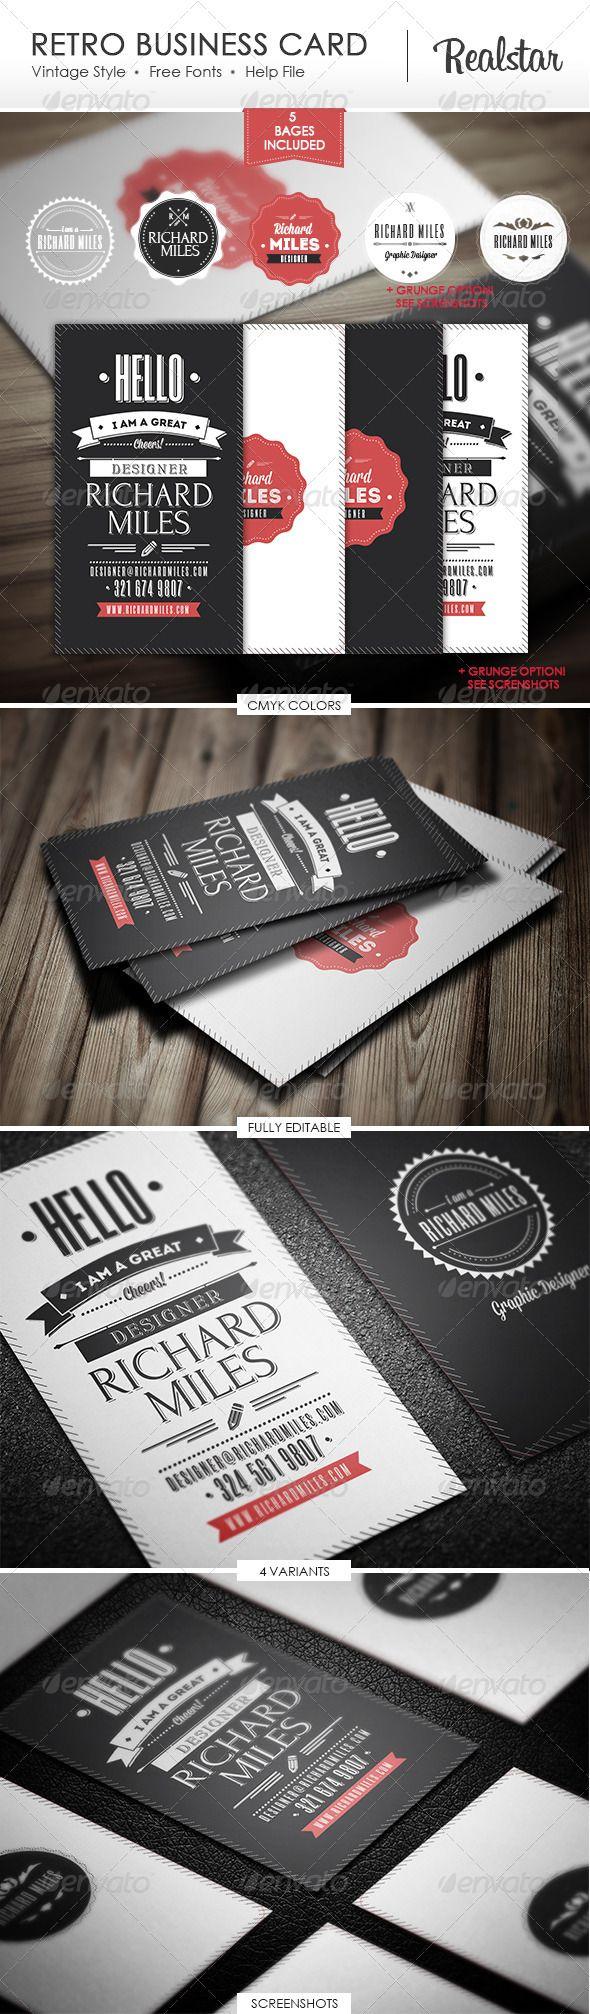 Retro Business Card Business Cards Retro Retro Business Card Business Card Design